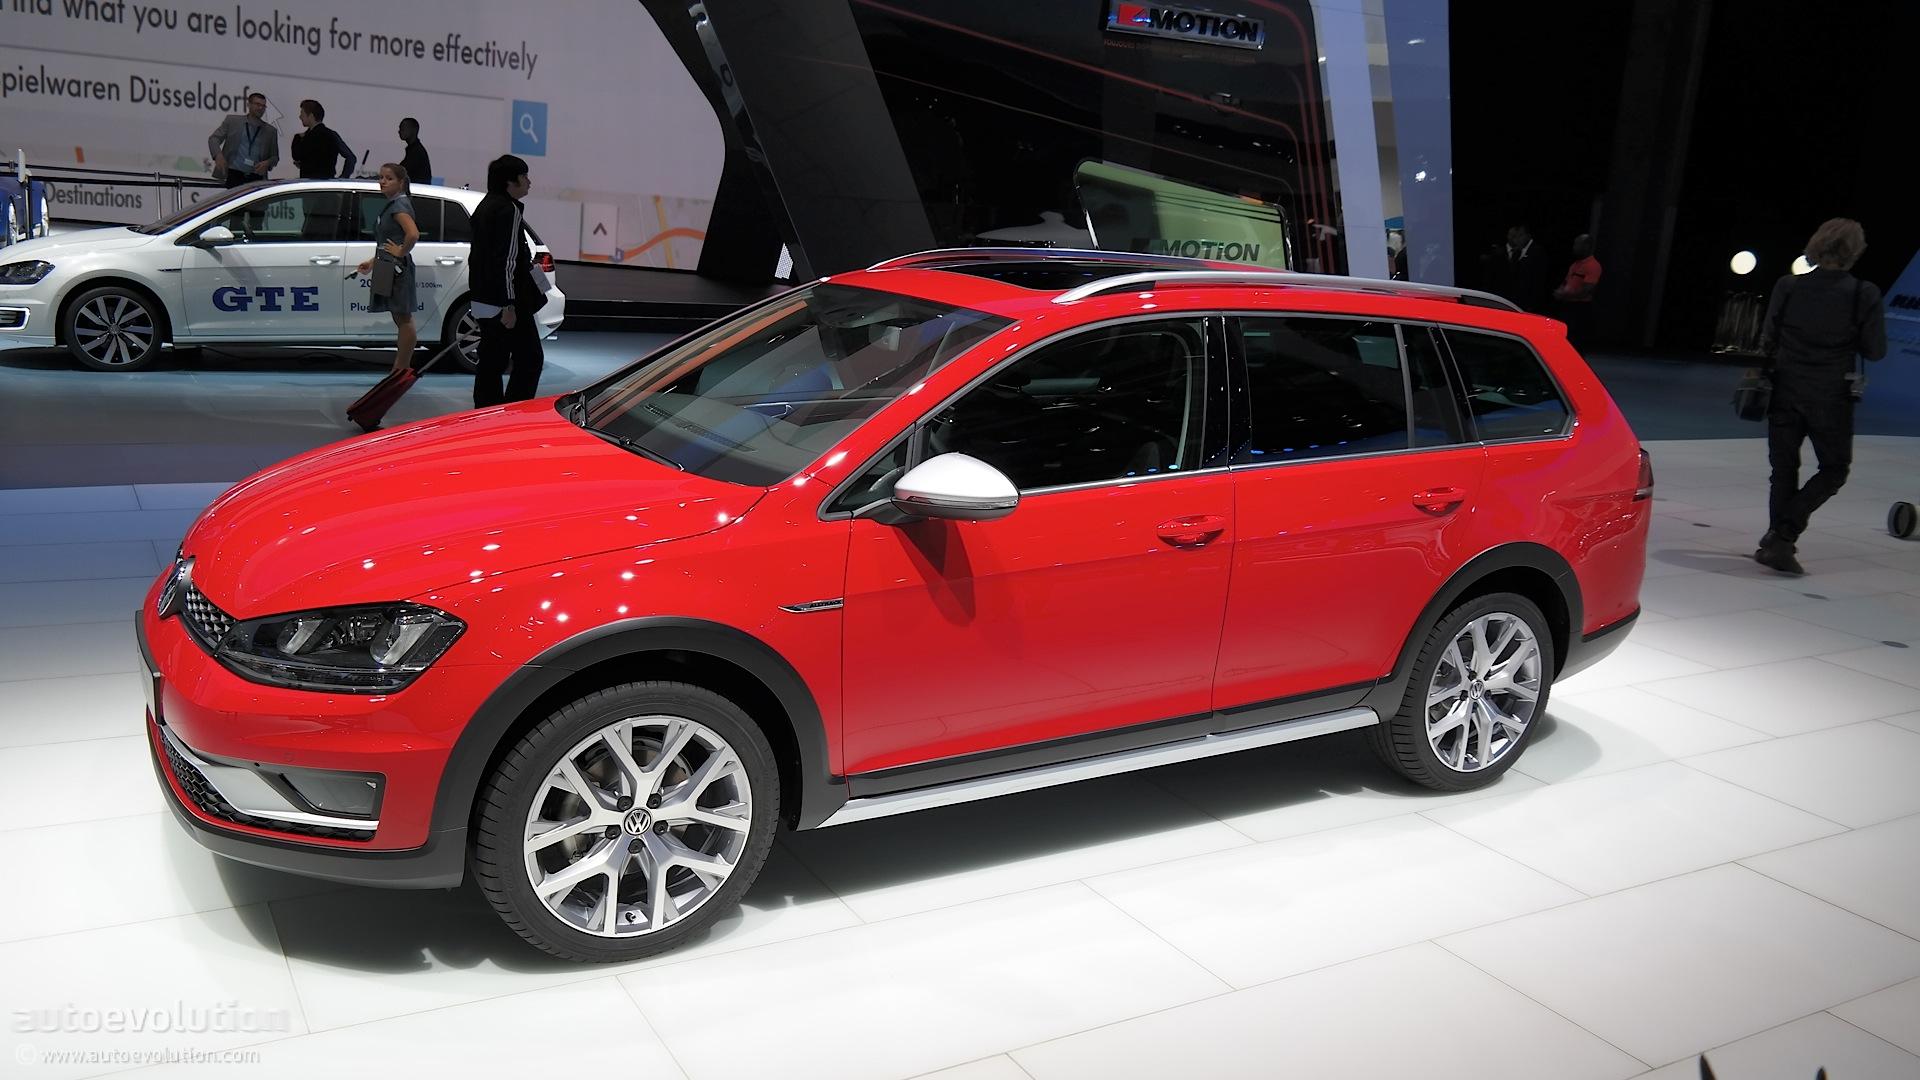 VW Golf SportWagen Alltrack US Debut Confirmed for 2016 - autoevolution